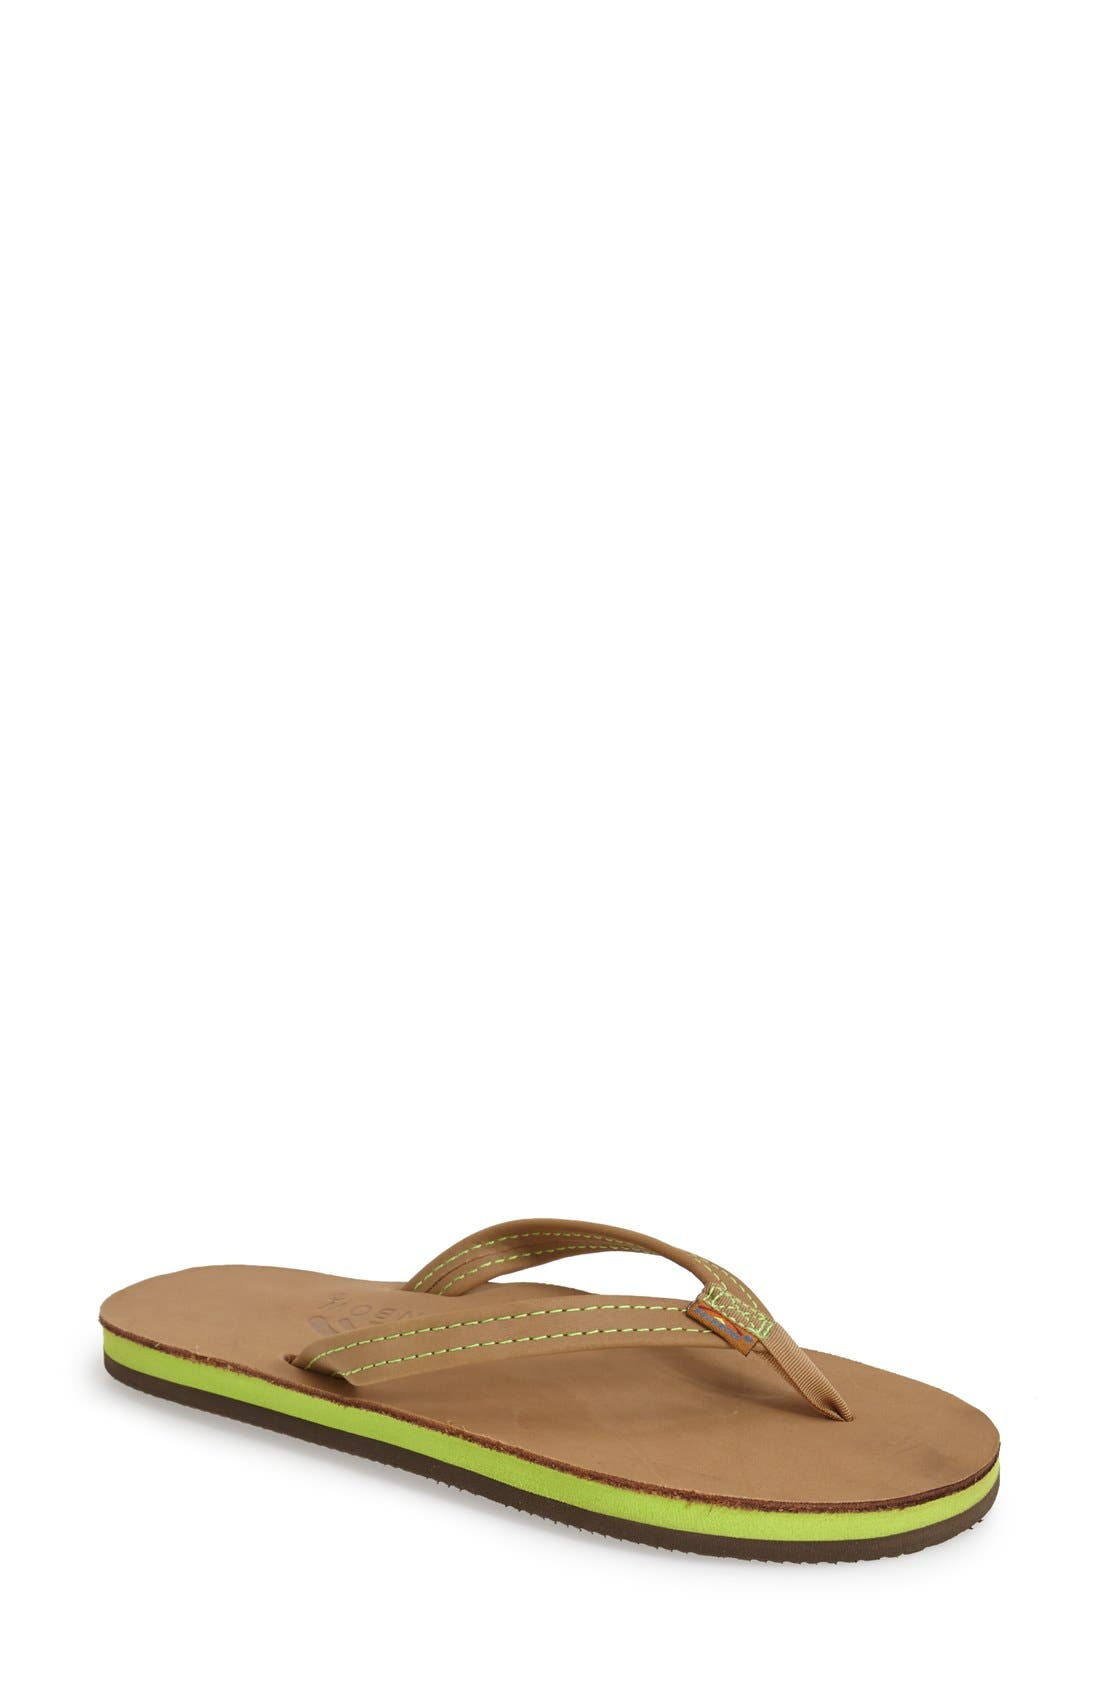 RAINBOW<SUP>®</SUP> Rainbow Double Layer Thong Sandal, Main, color, 320